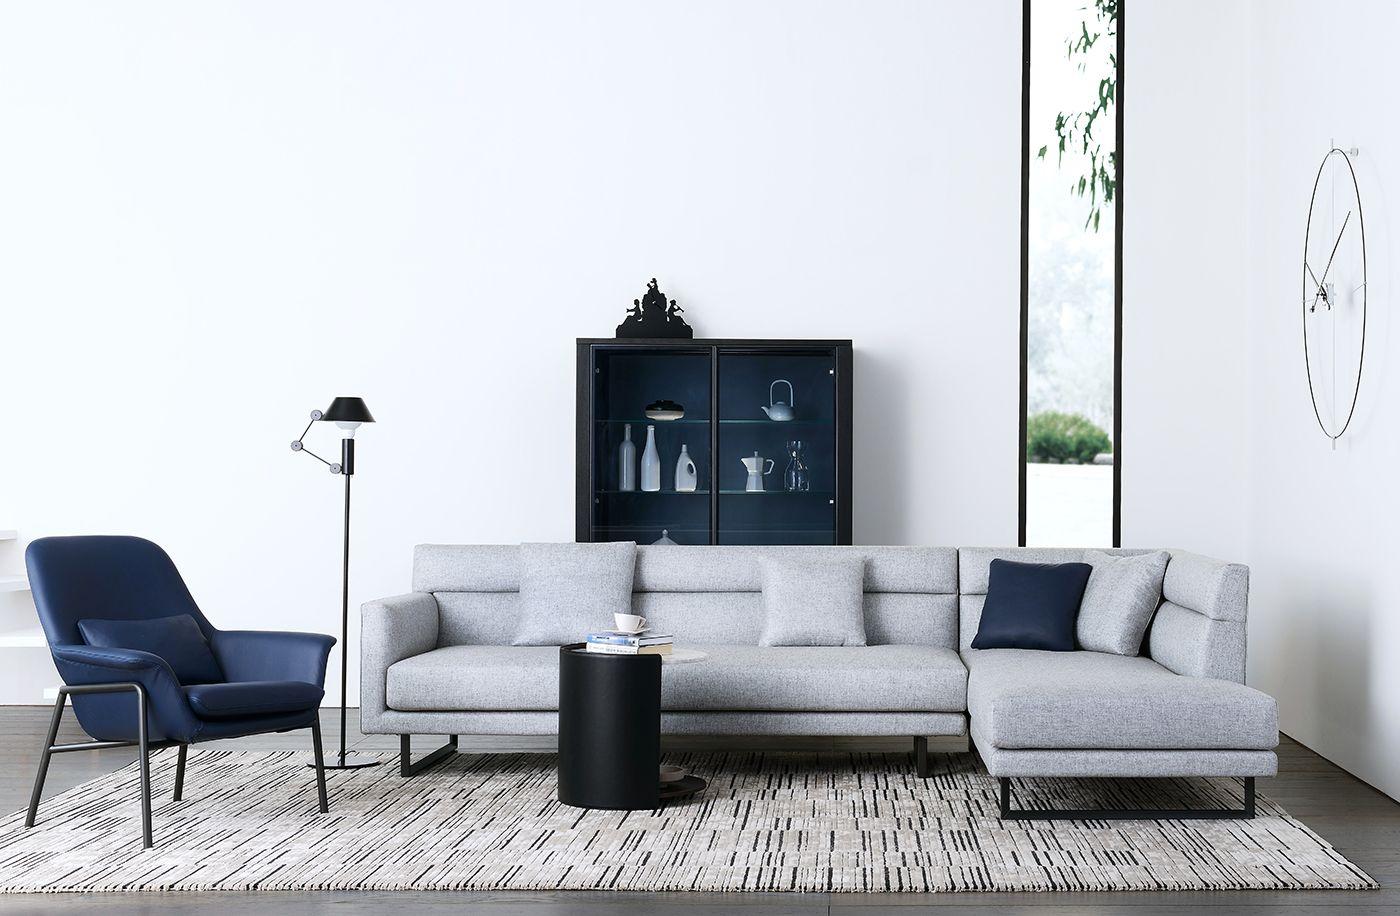 Camerich home furniture   simple scandi style   home decor